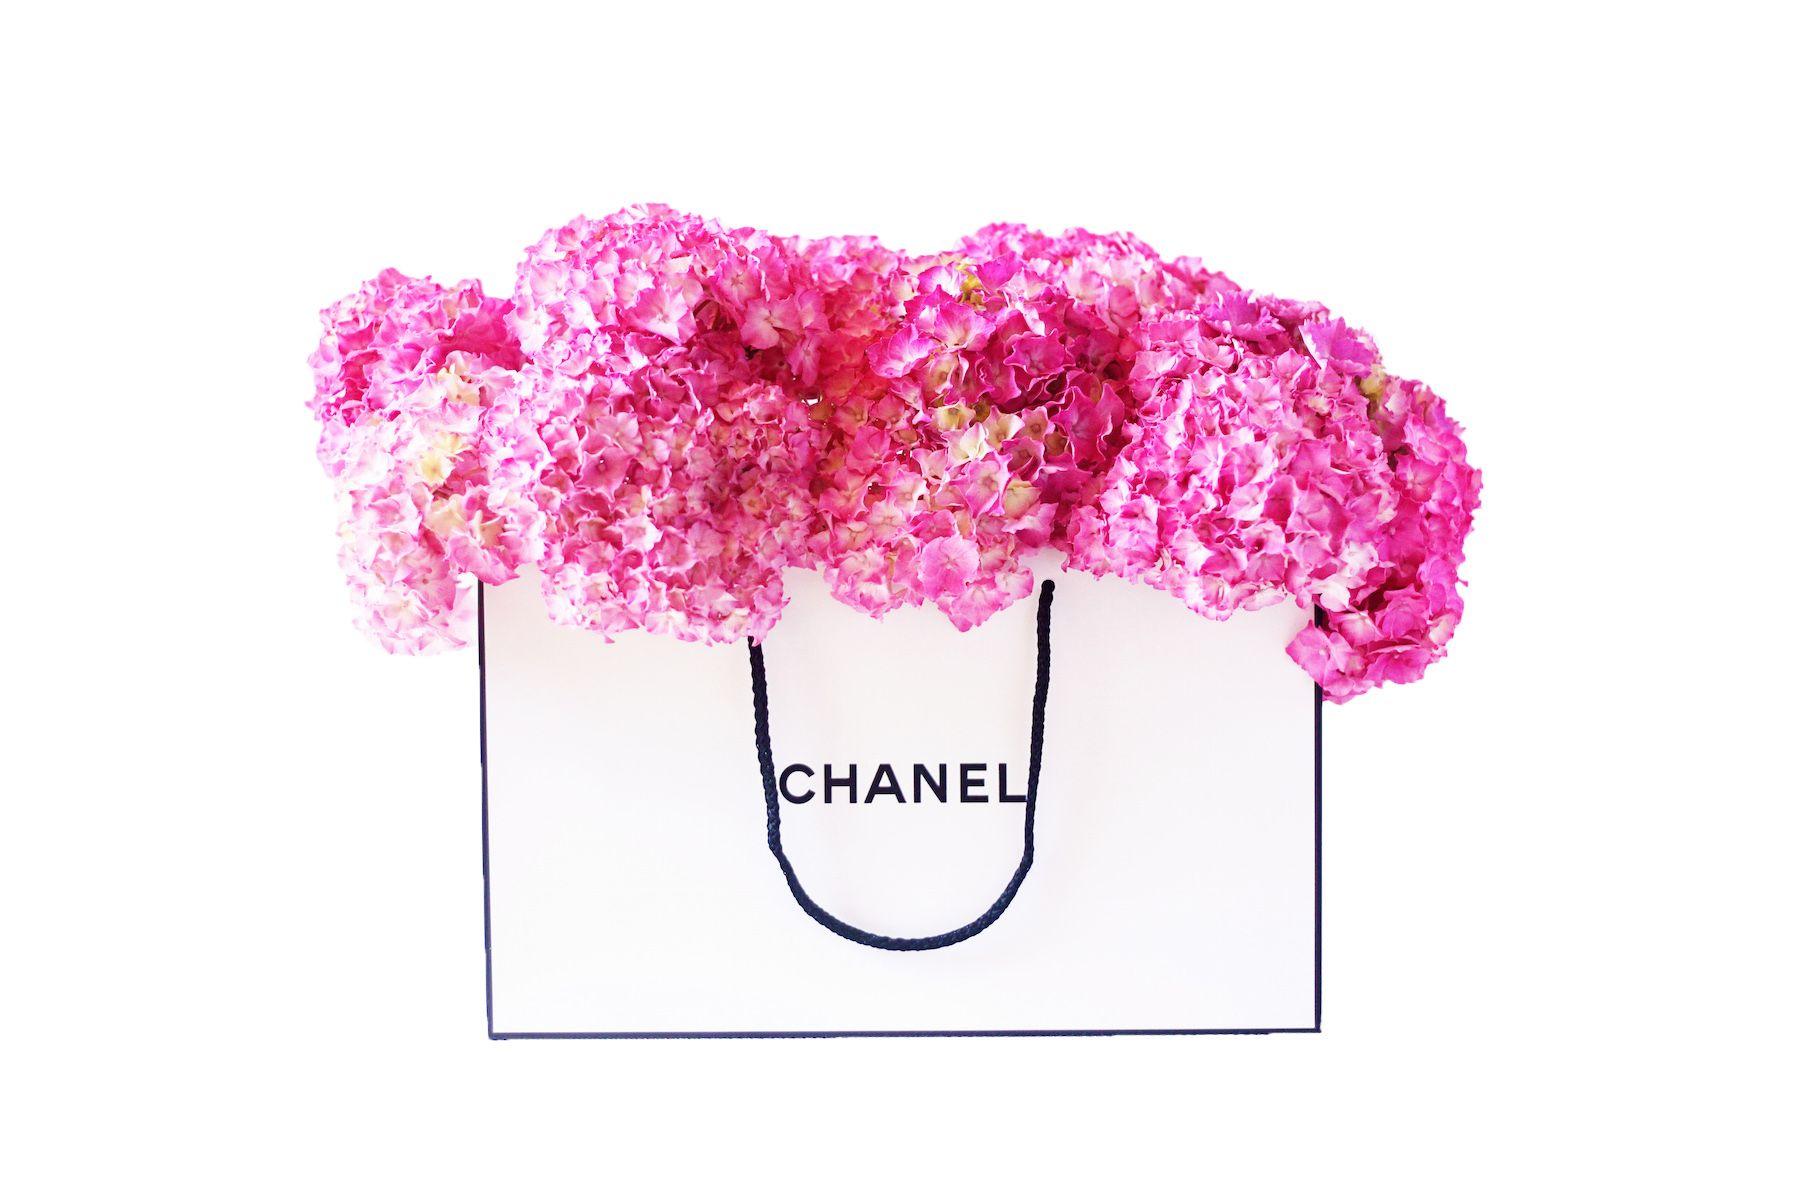 Chanel Desktop Jpg 1800 215 1200 Chanel Wallpapers Pinterest